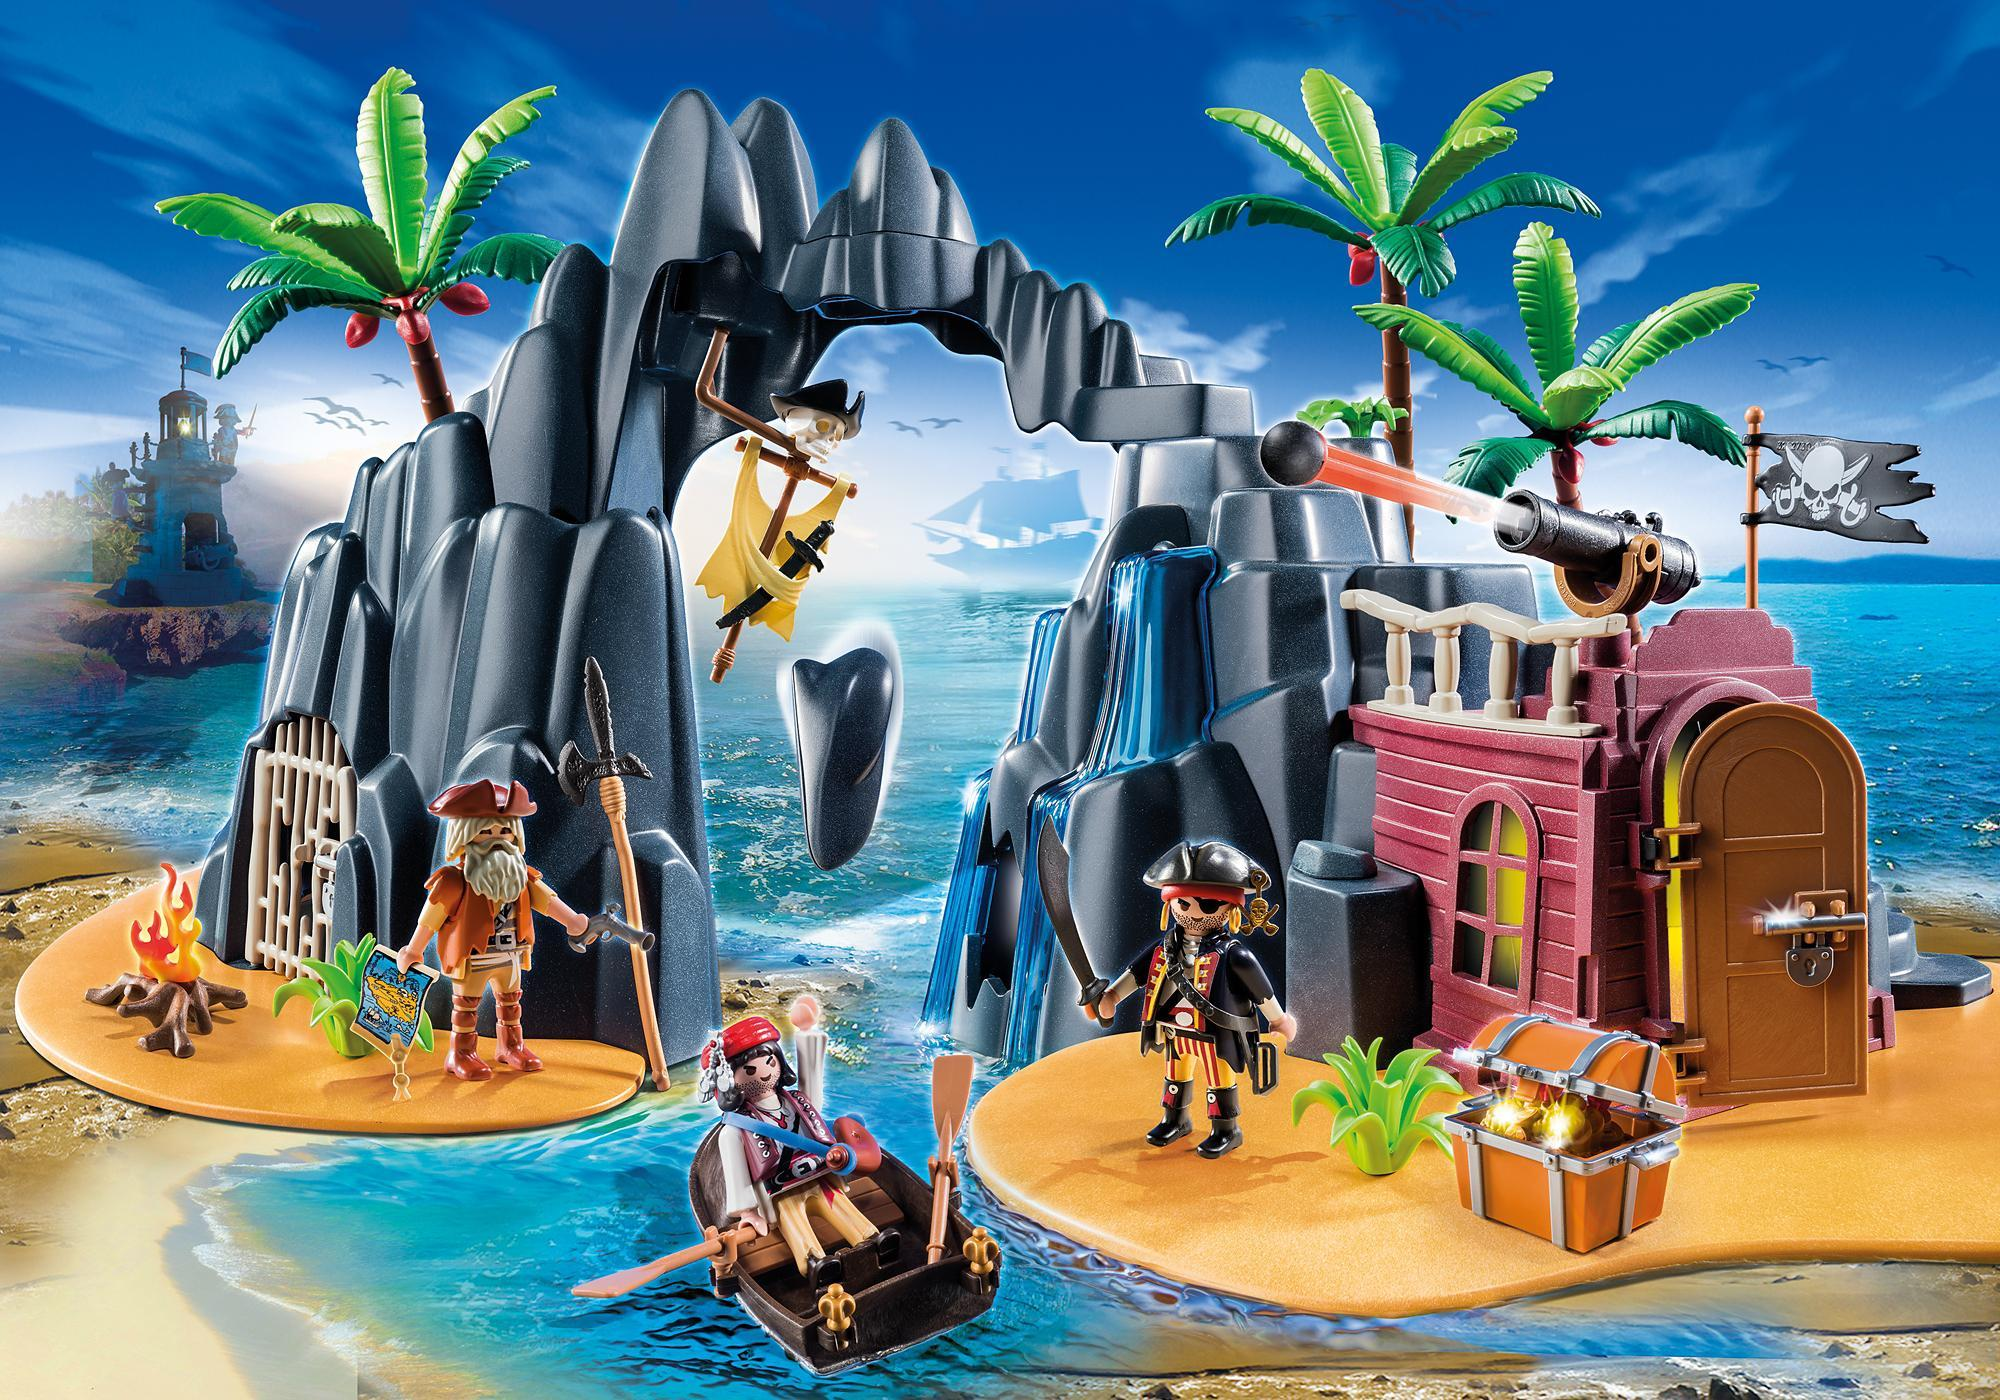 http://media.playmobil.com/i/playmobil/6679_product_detail/Isola del tesoro fortificata